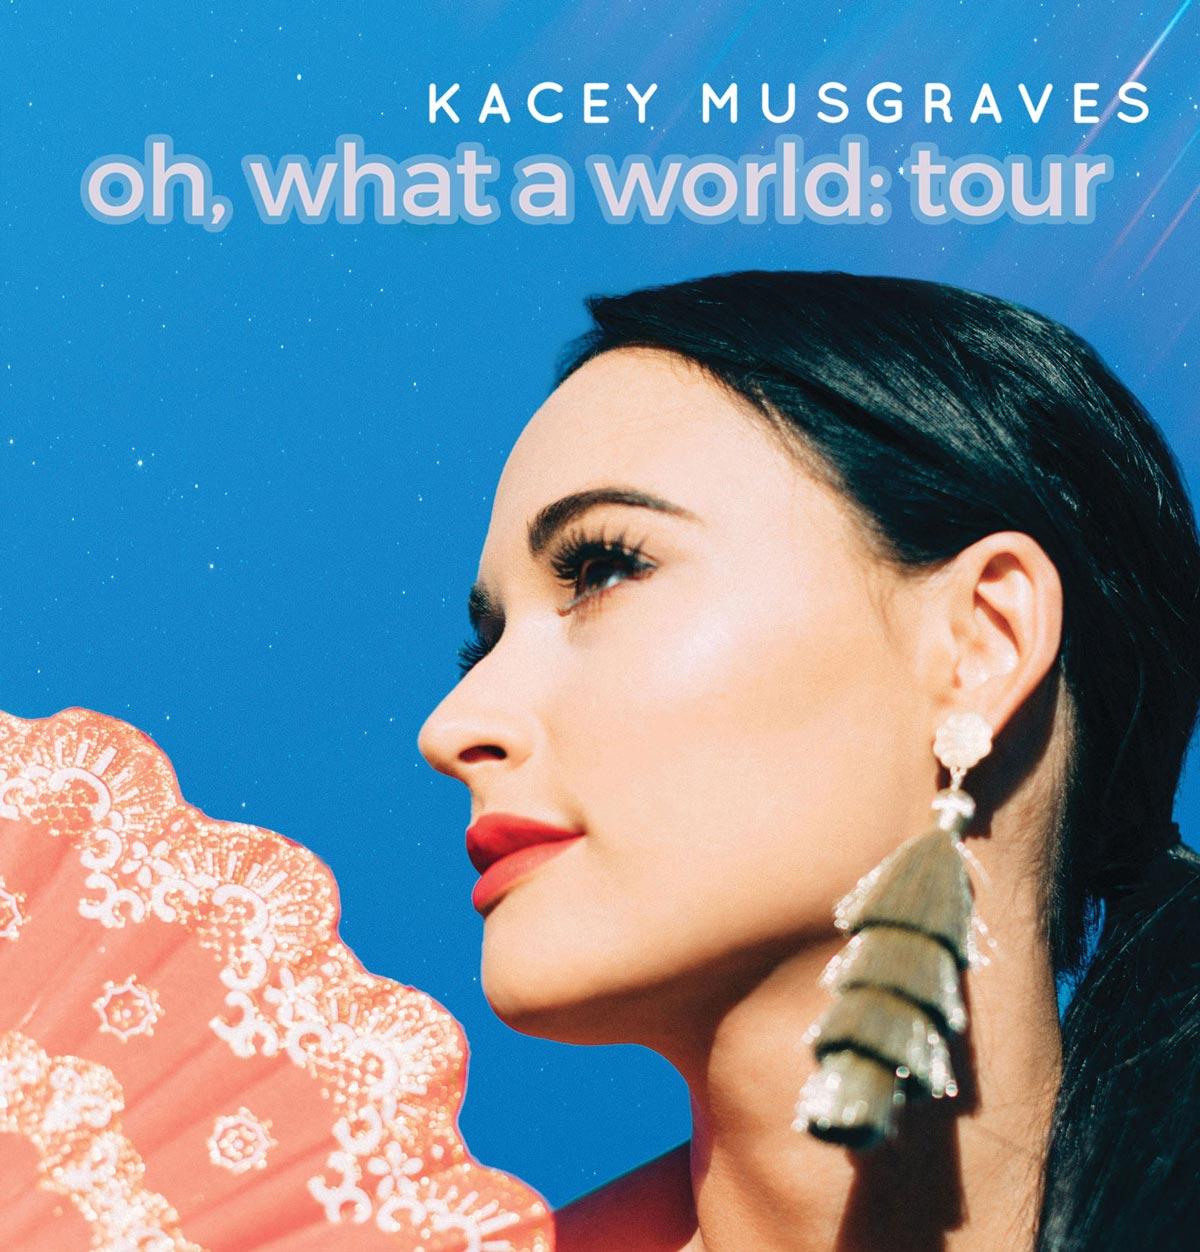 logo-kacey-musgraves-oh-tour